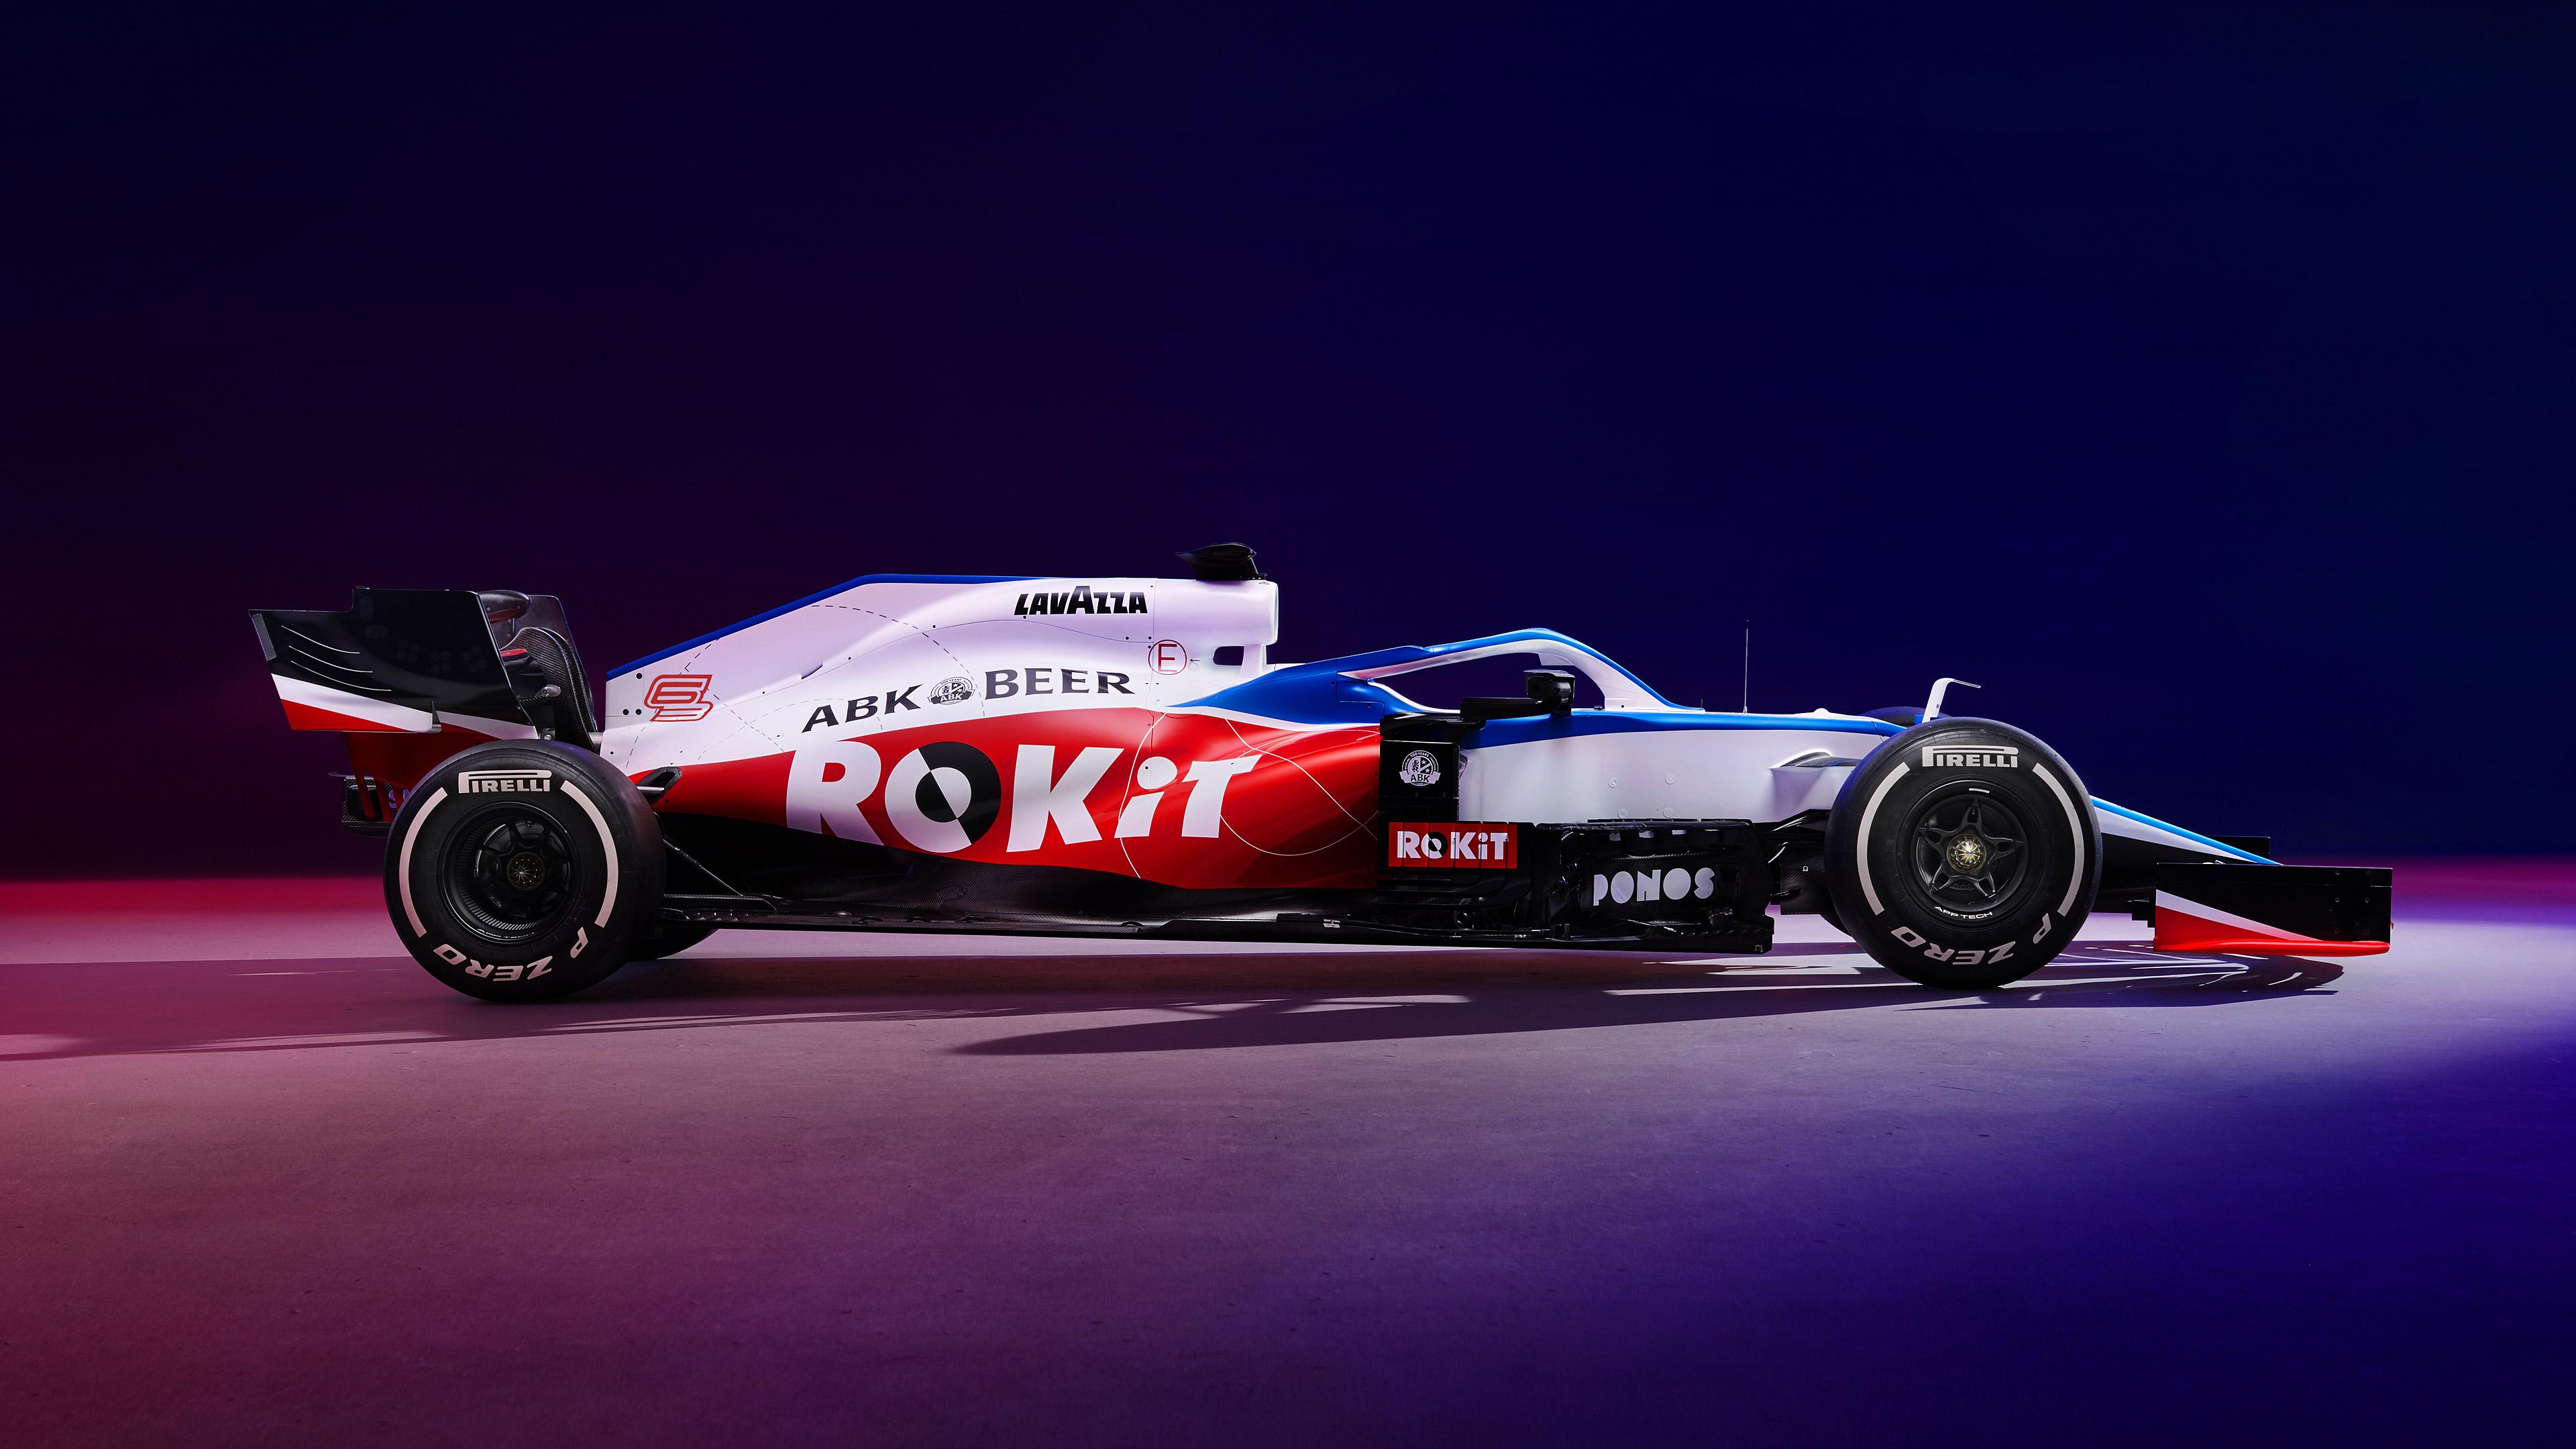 Wallpaper : Williams F1, Formula 1, car, vehicle, race ...